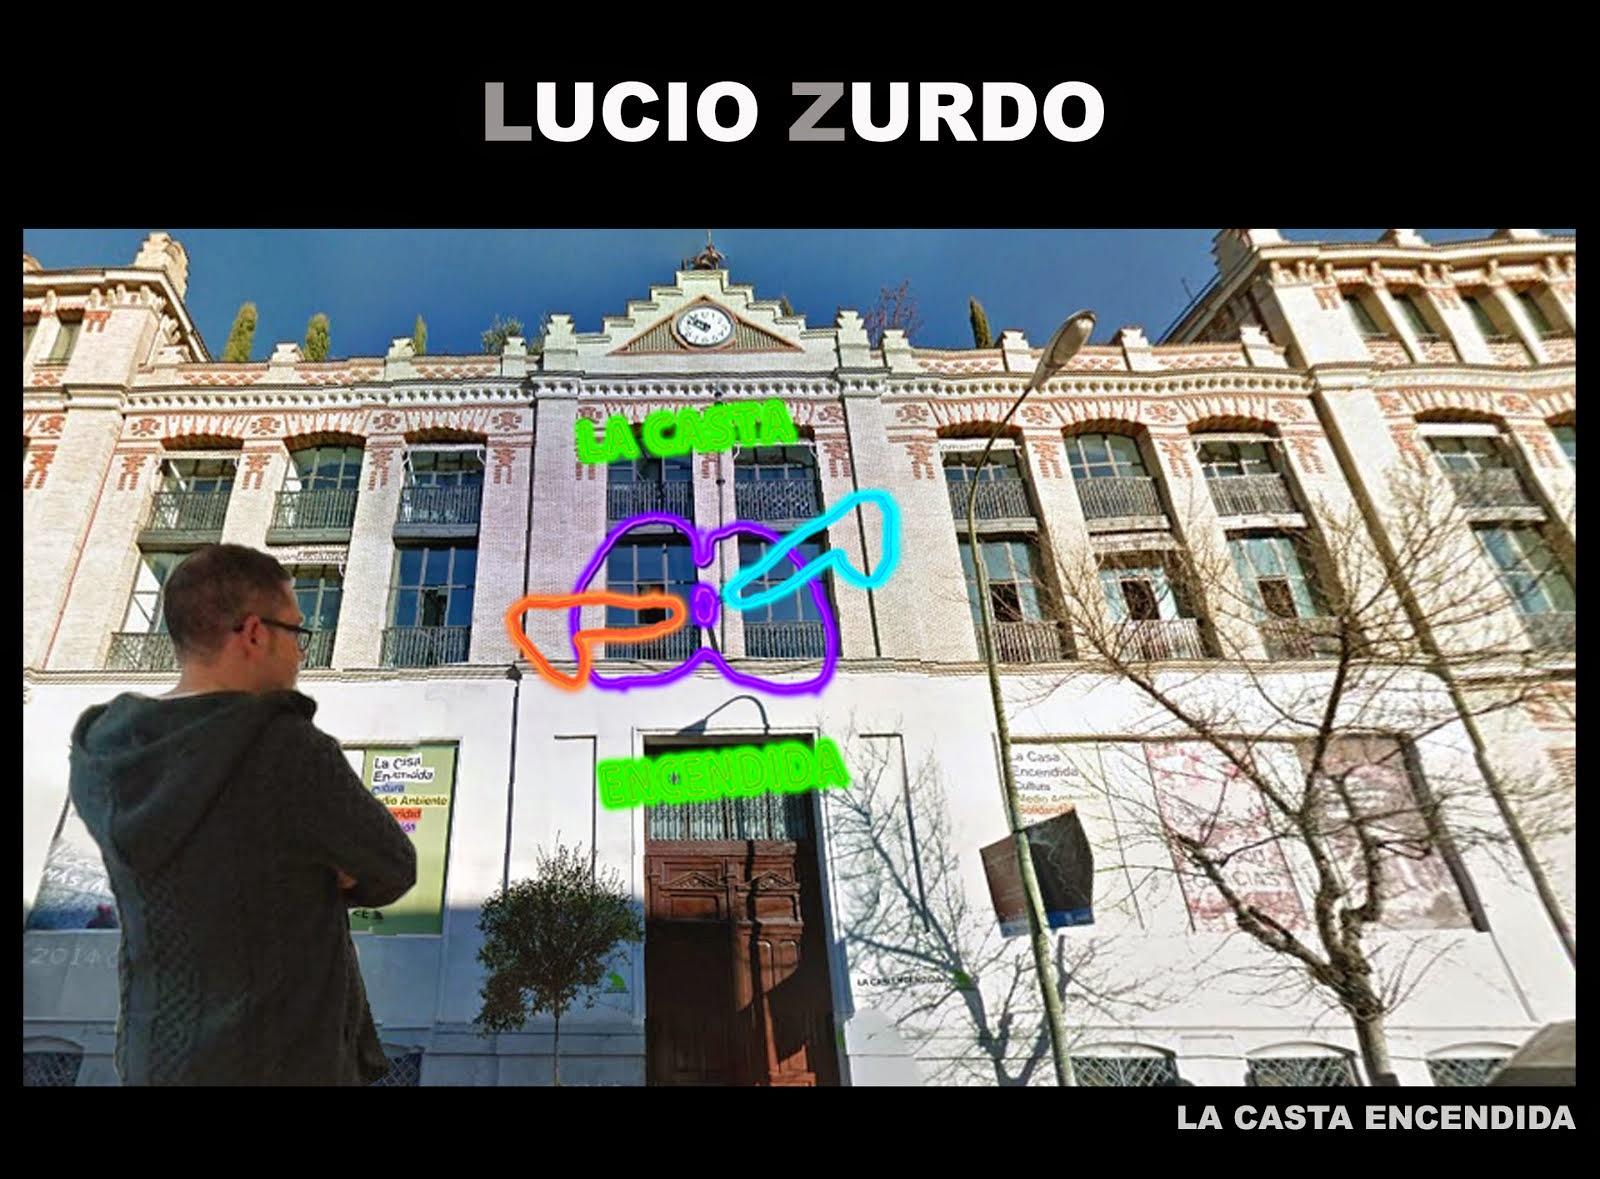 LUCIO ZURDO